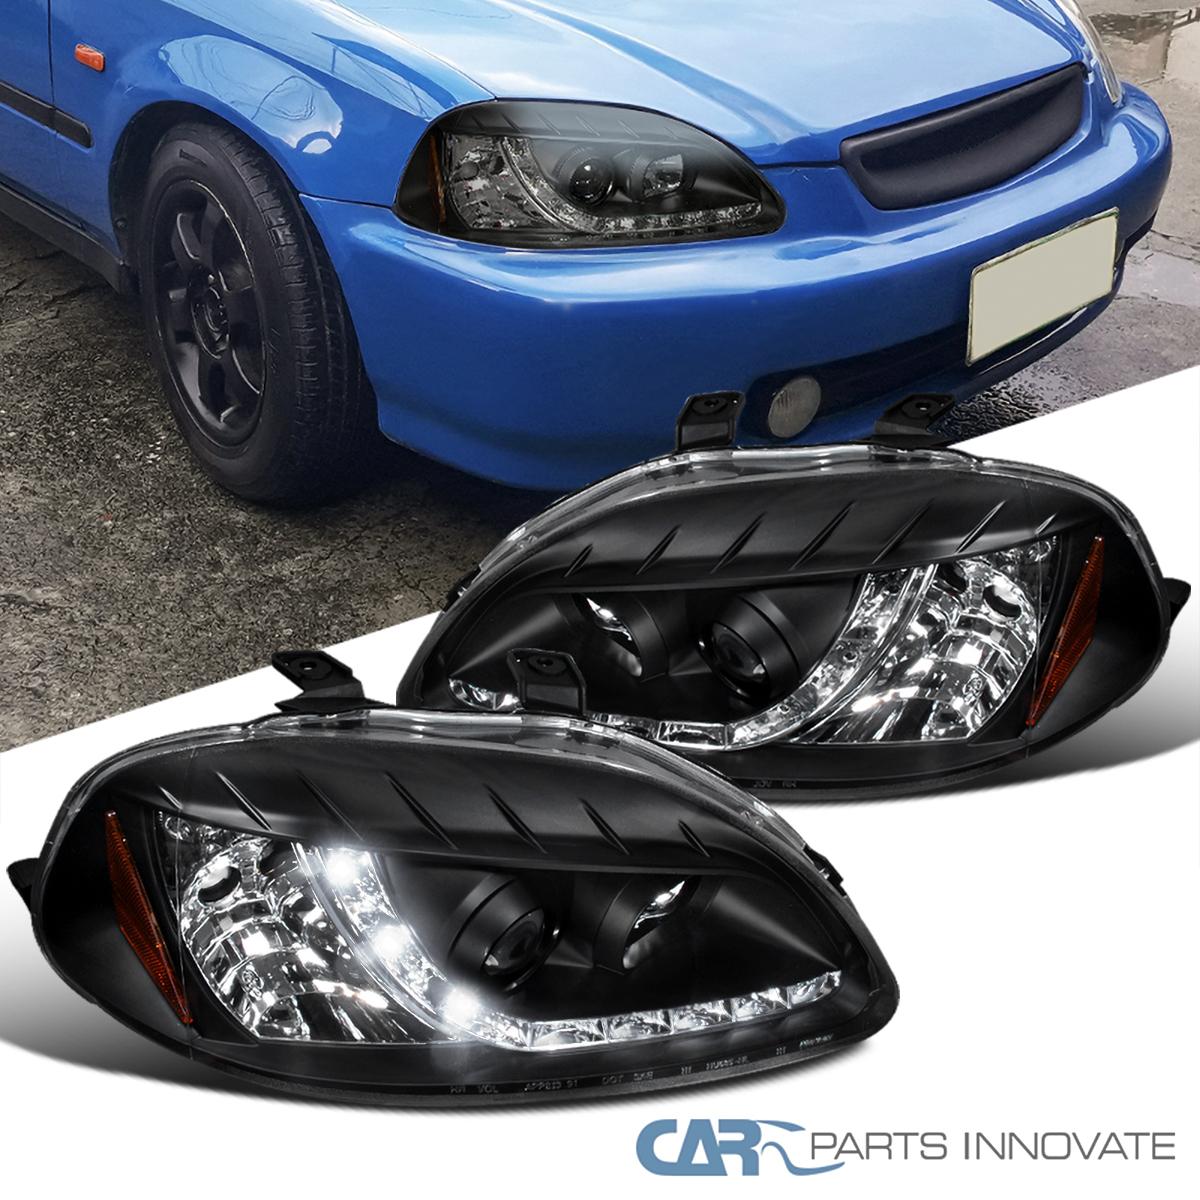 For Honda 96-98 Civic 2/3/4Dr Black Projector Headlights